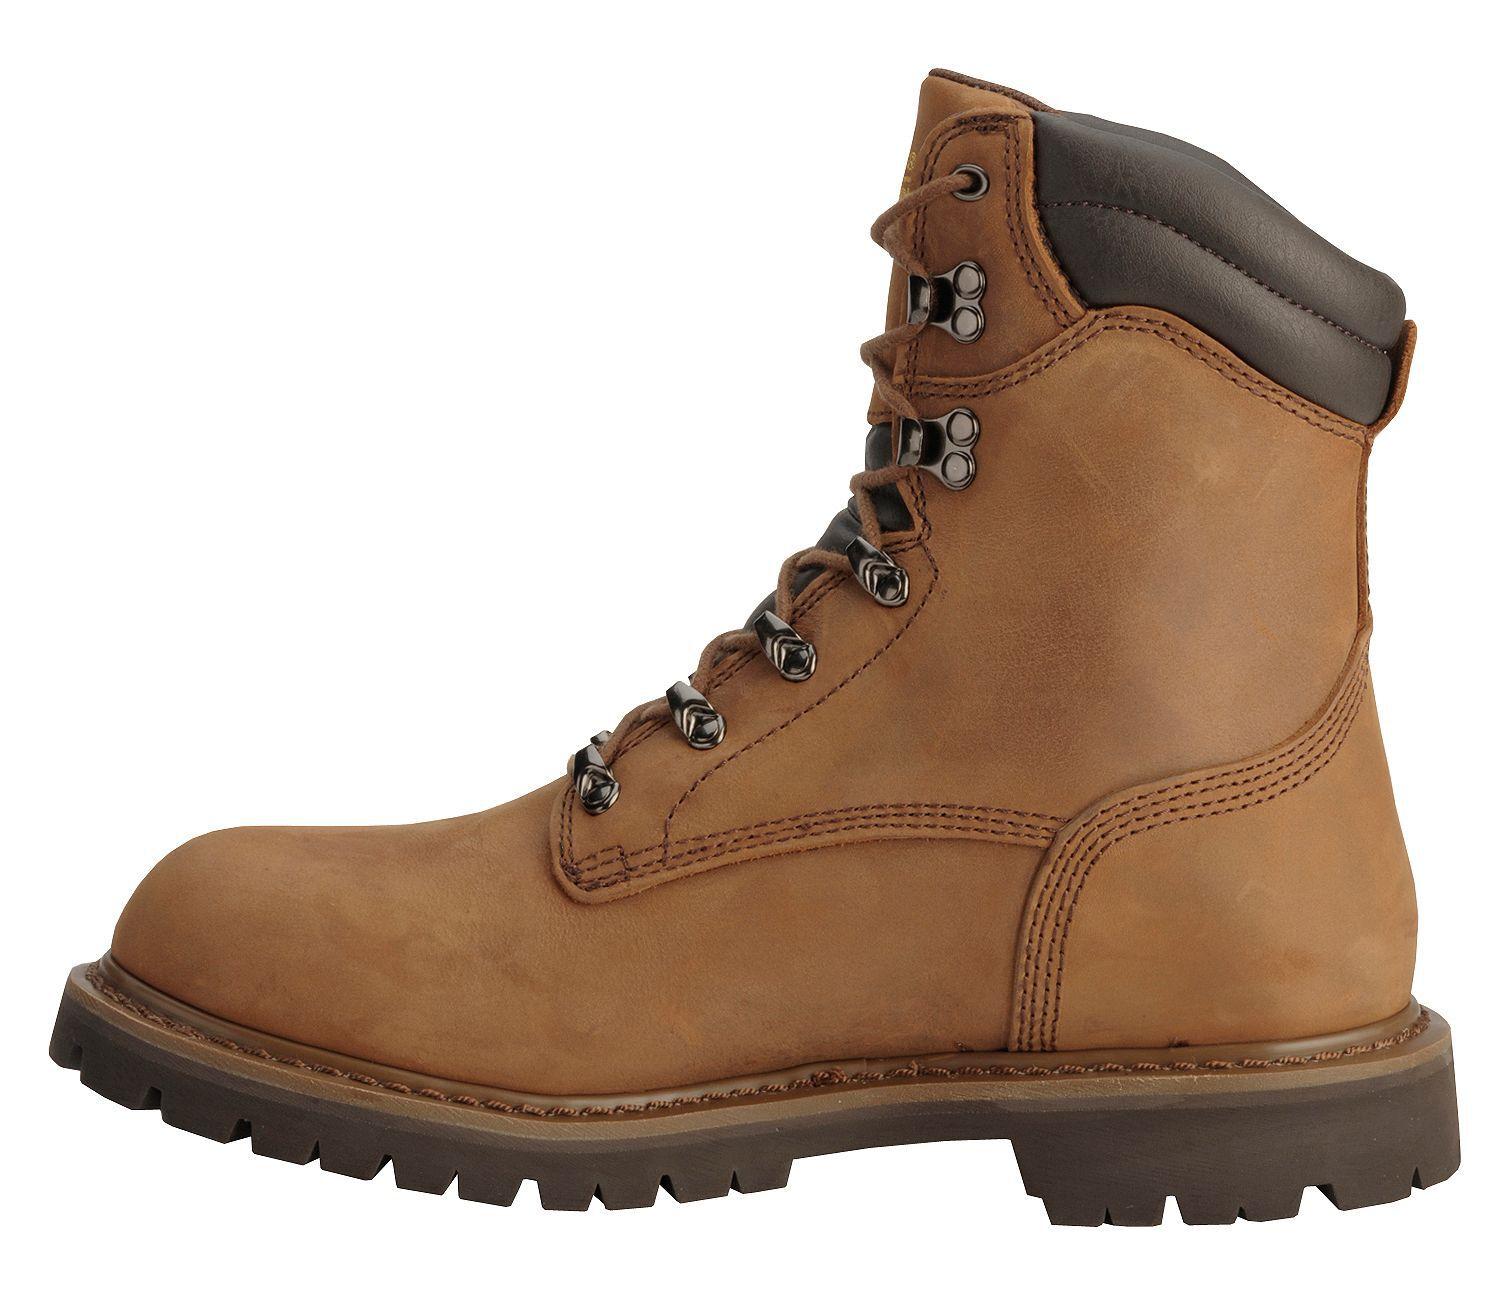 Chippewa Heavy Duty Waterproof \u0026